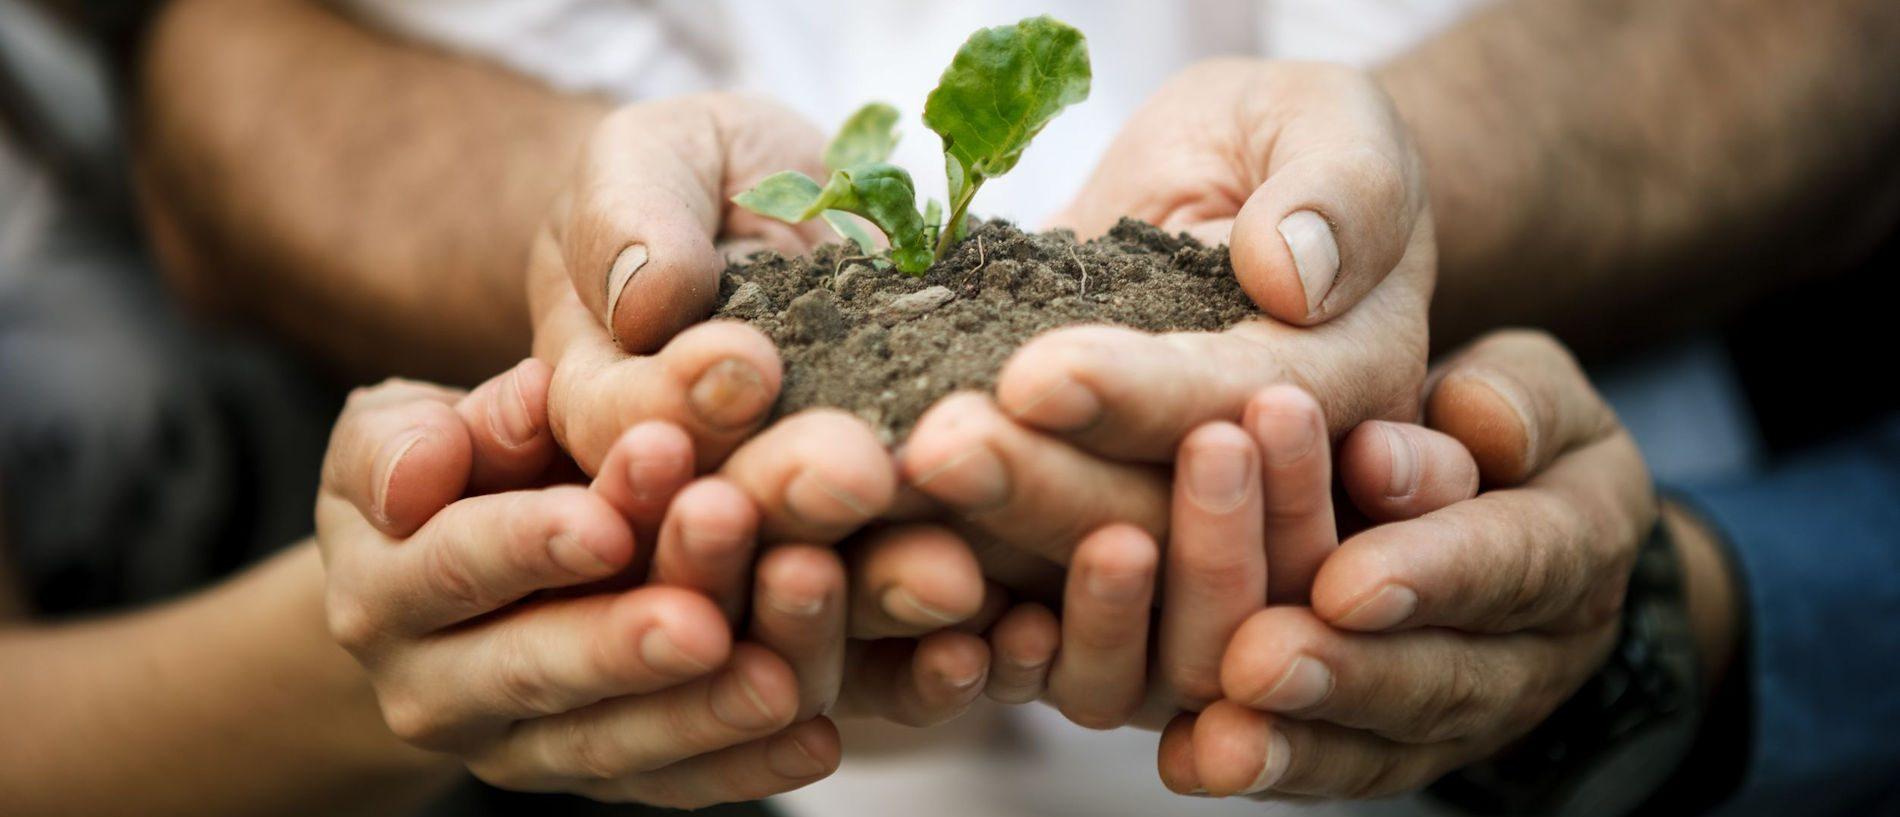 Holding-Soil-in-hands